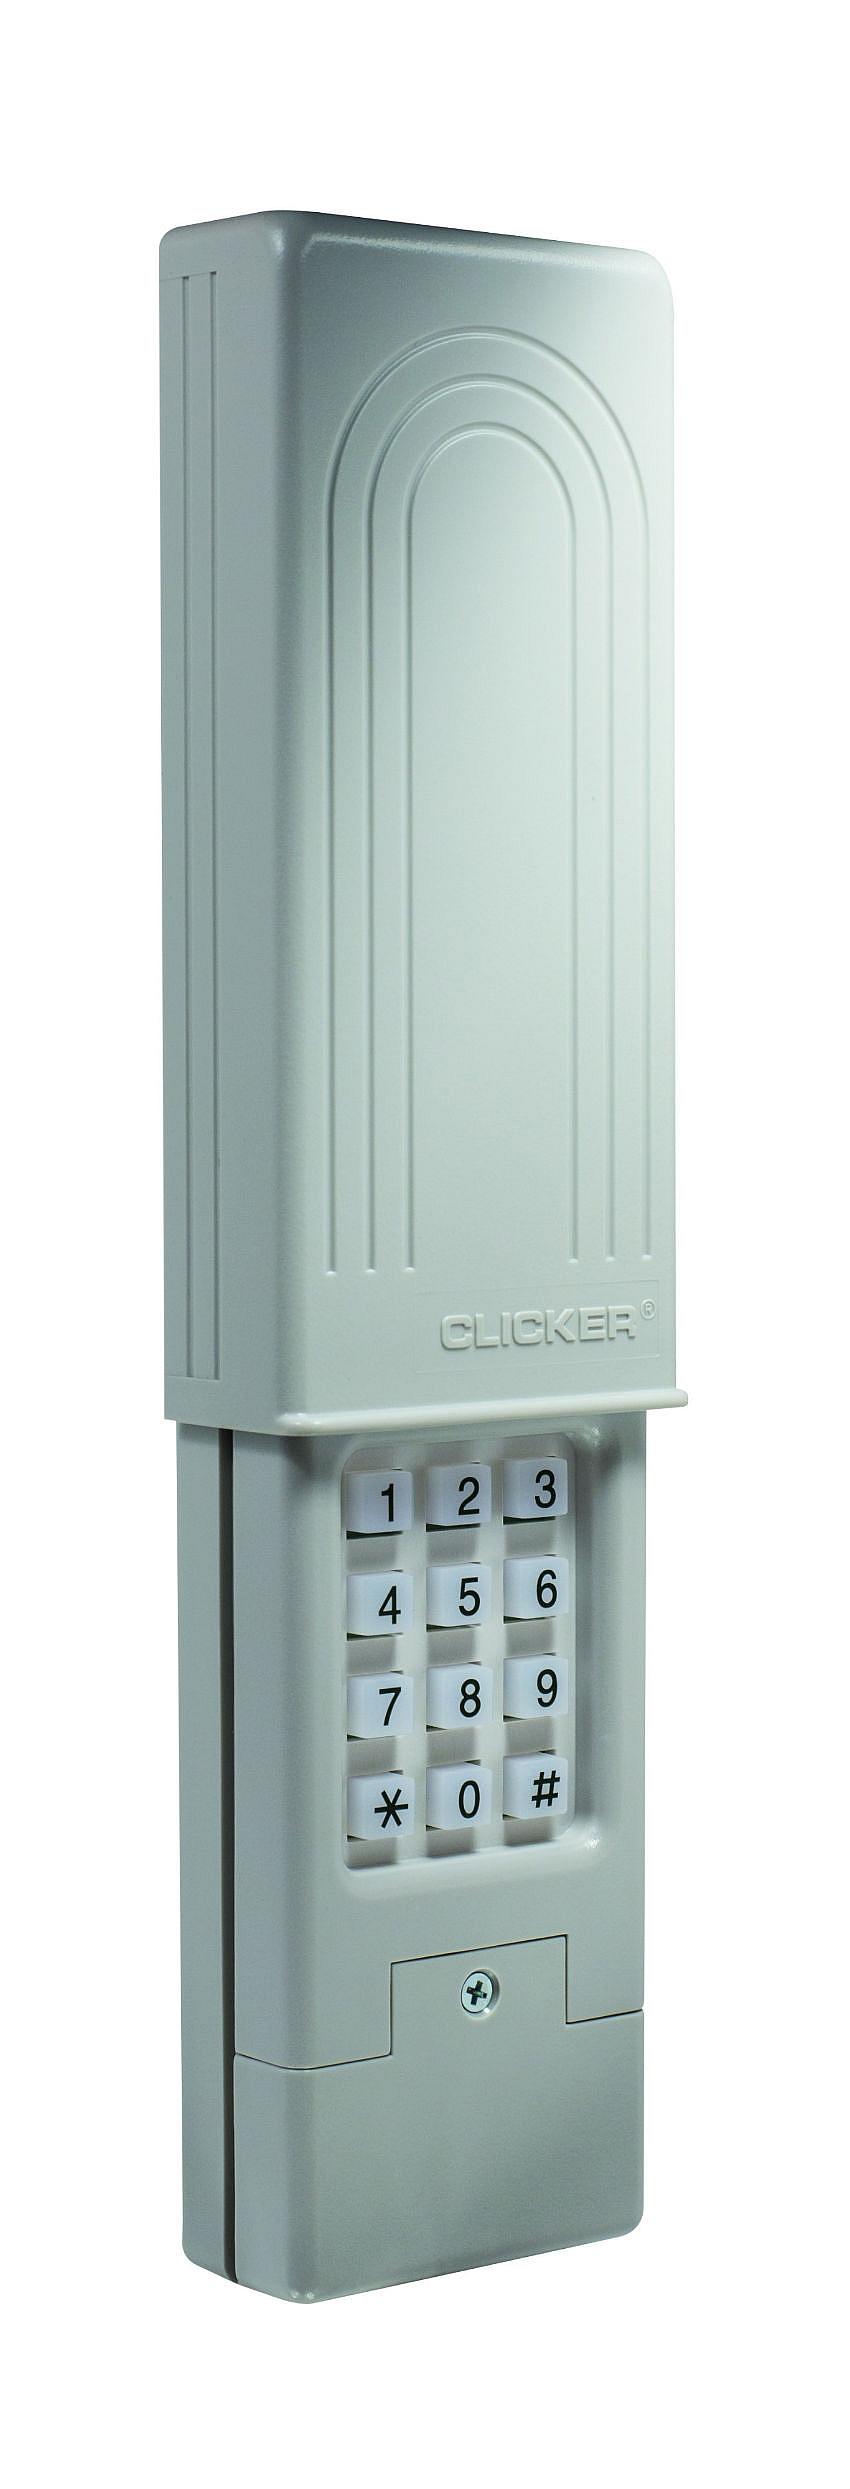 Chamberlain Klik2u P2 Original Clicker Universal Wireless